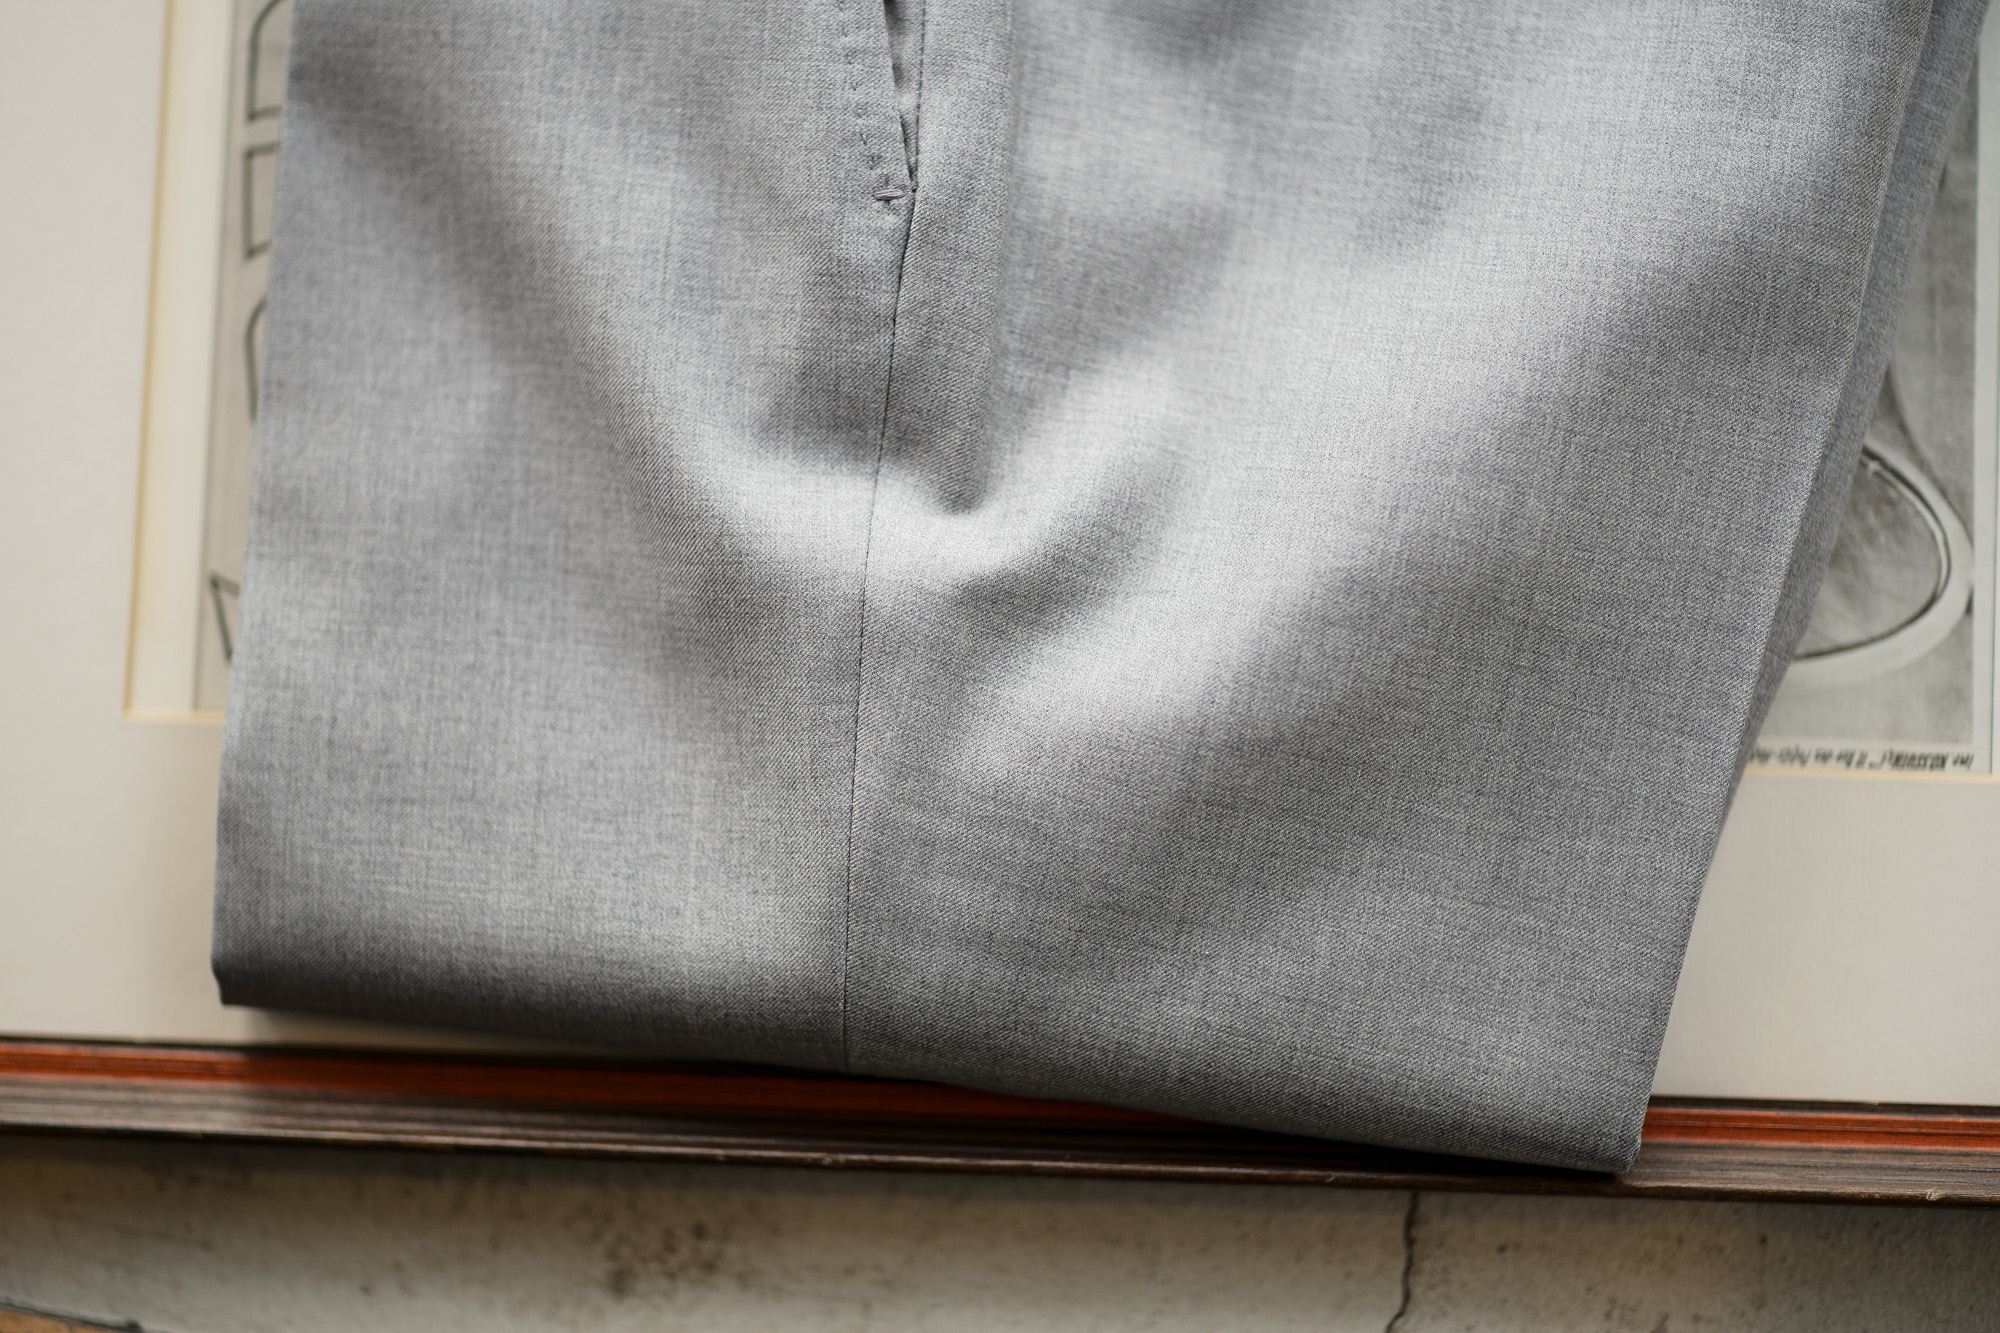 INCOTEX (インコテックス) SARTORIALE (サルトリアーレ) MIT300 SLIM FIT (WOOL & CASHMERE TWILL) ウールカシミアツイル スラックス LIGHT GRAY (ライトグレー・900) Made in italy (イタリア製) 2019 春夏新作 愛知 名古屋 altoediritto アルトエデリット